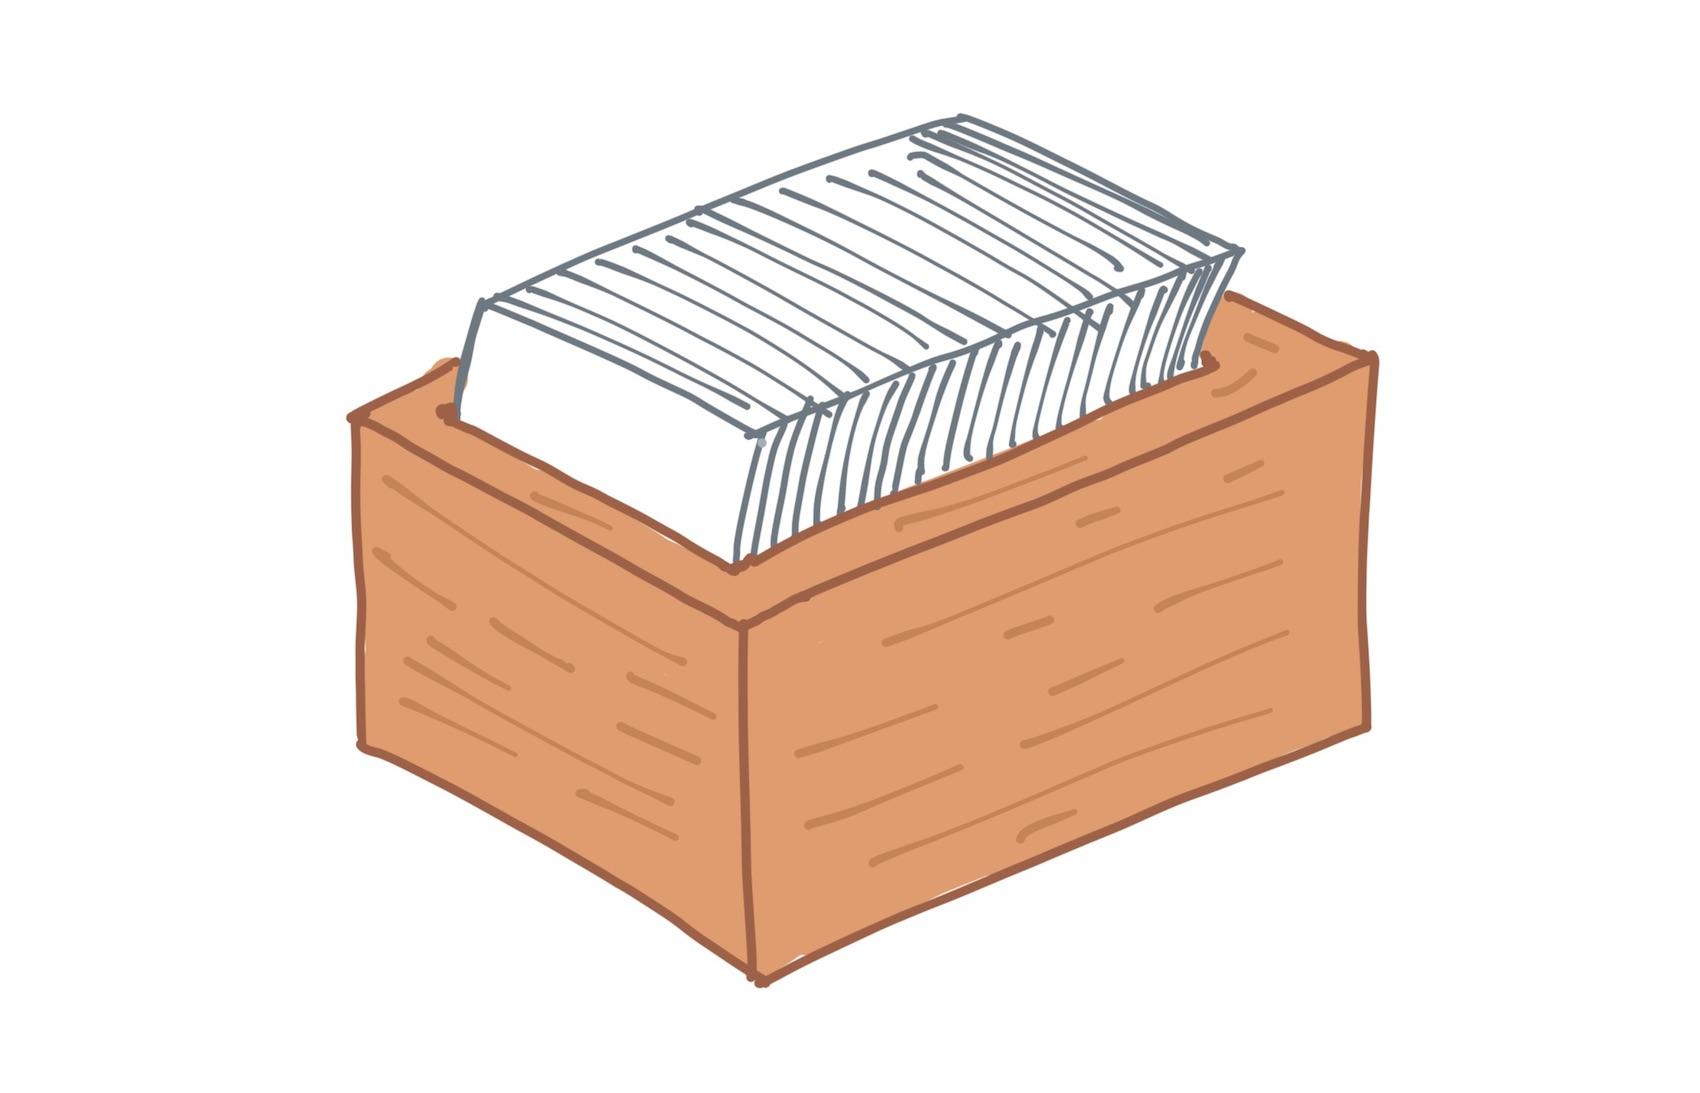 Slip-box